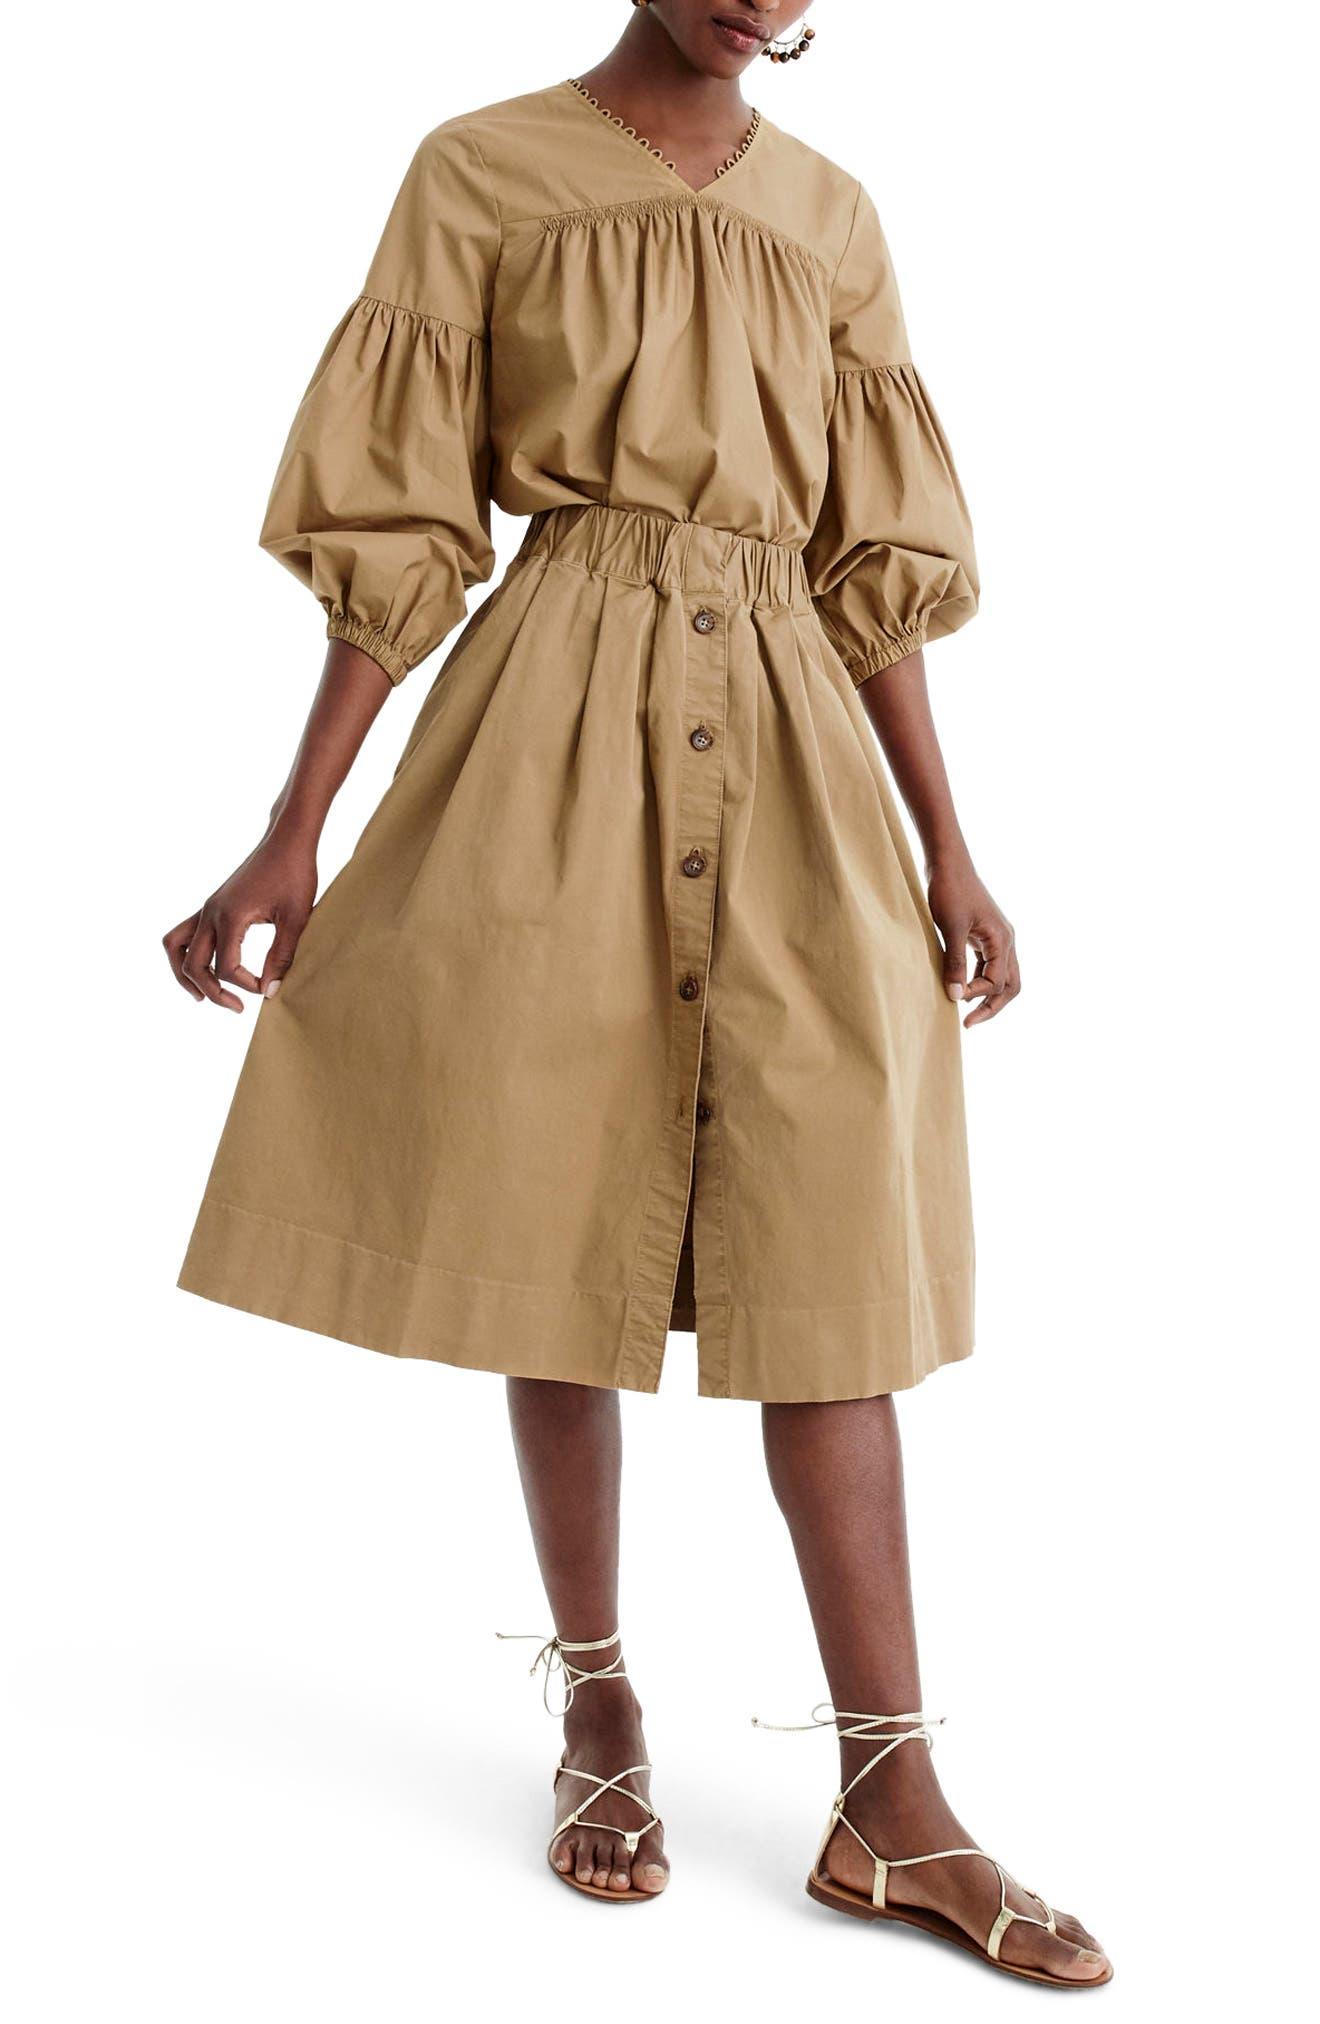 J. CREW J.Crew Button Front Chino Skirt